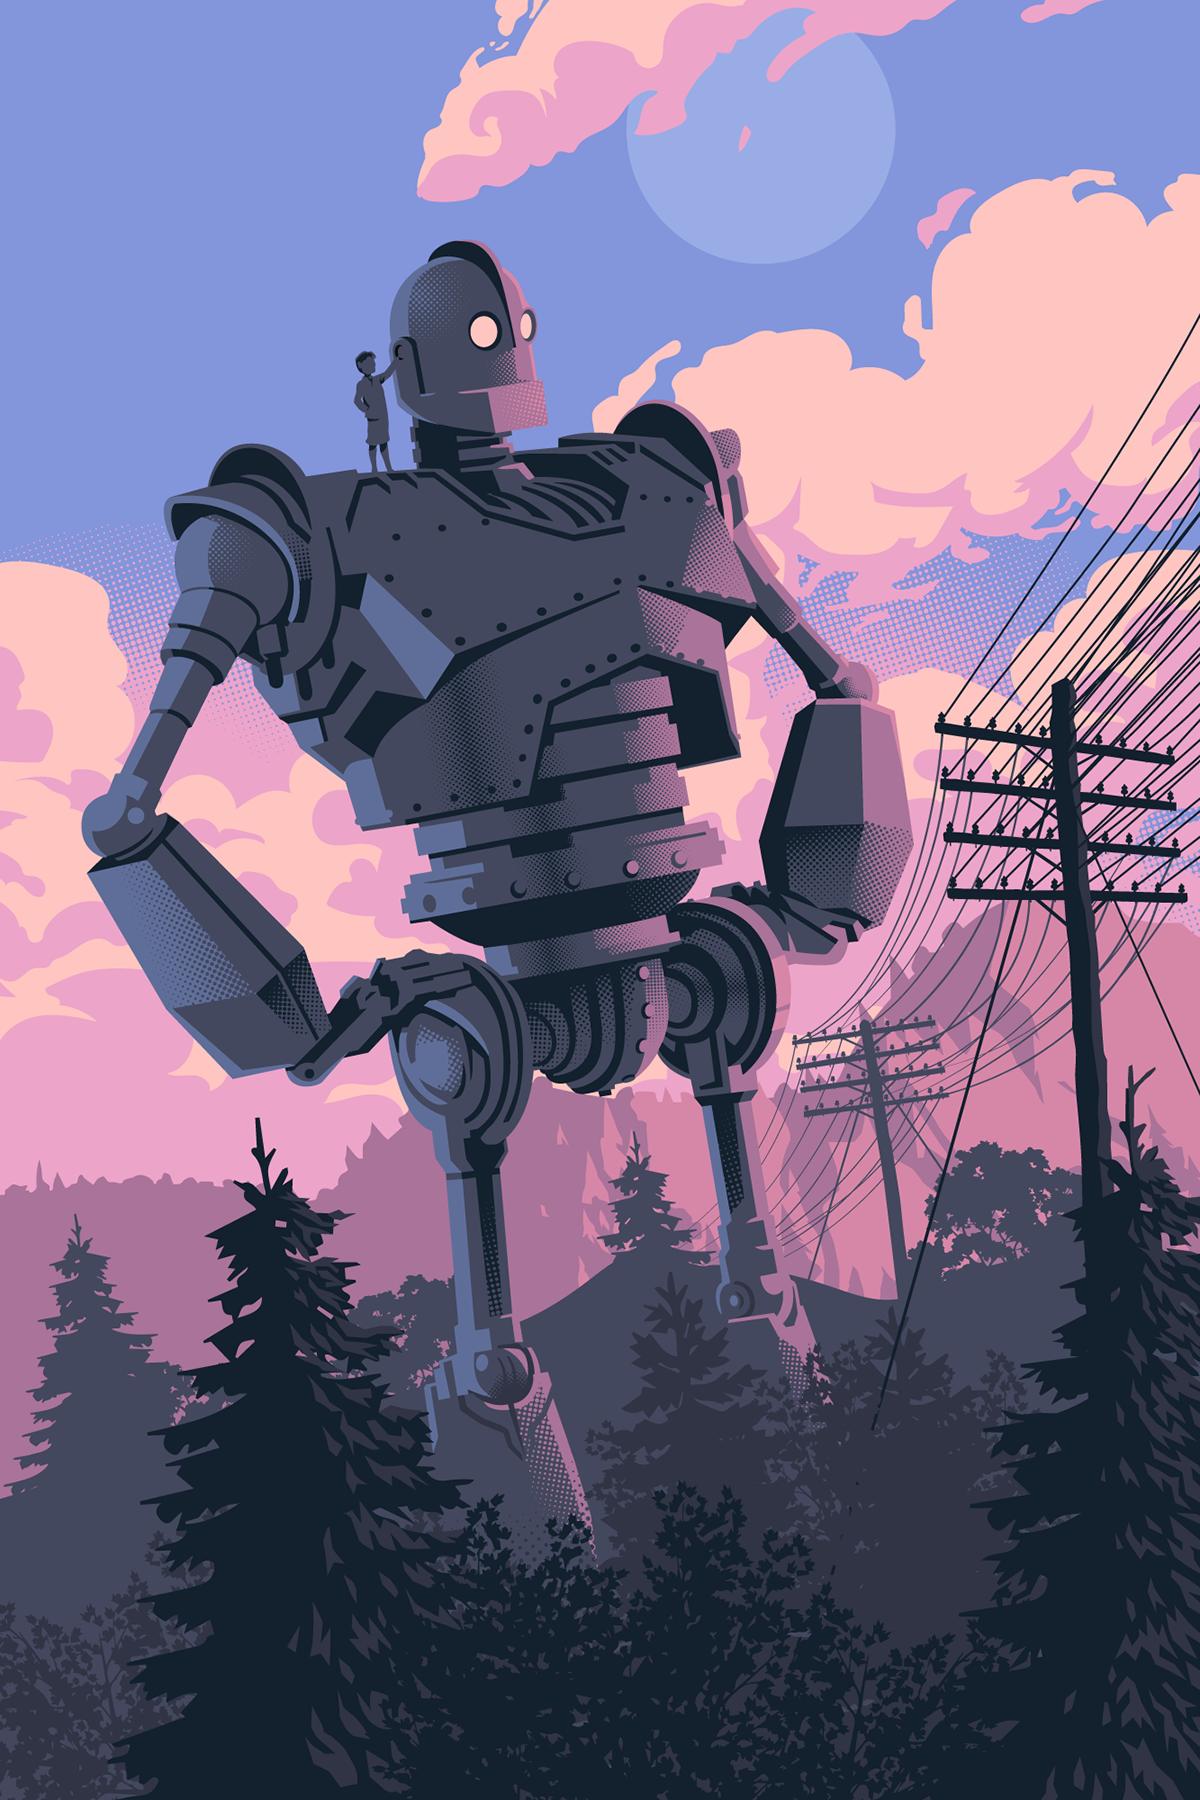 Iron Giant Illustration on Behance